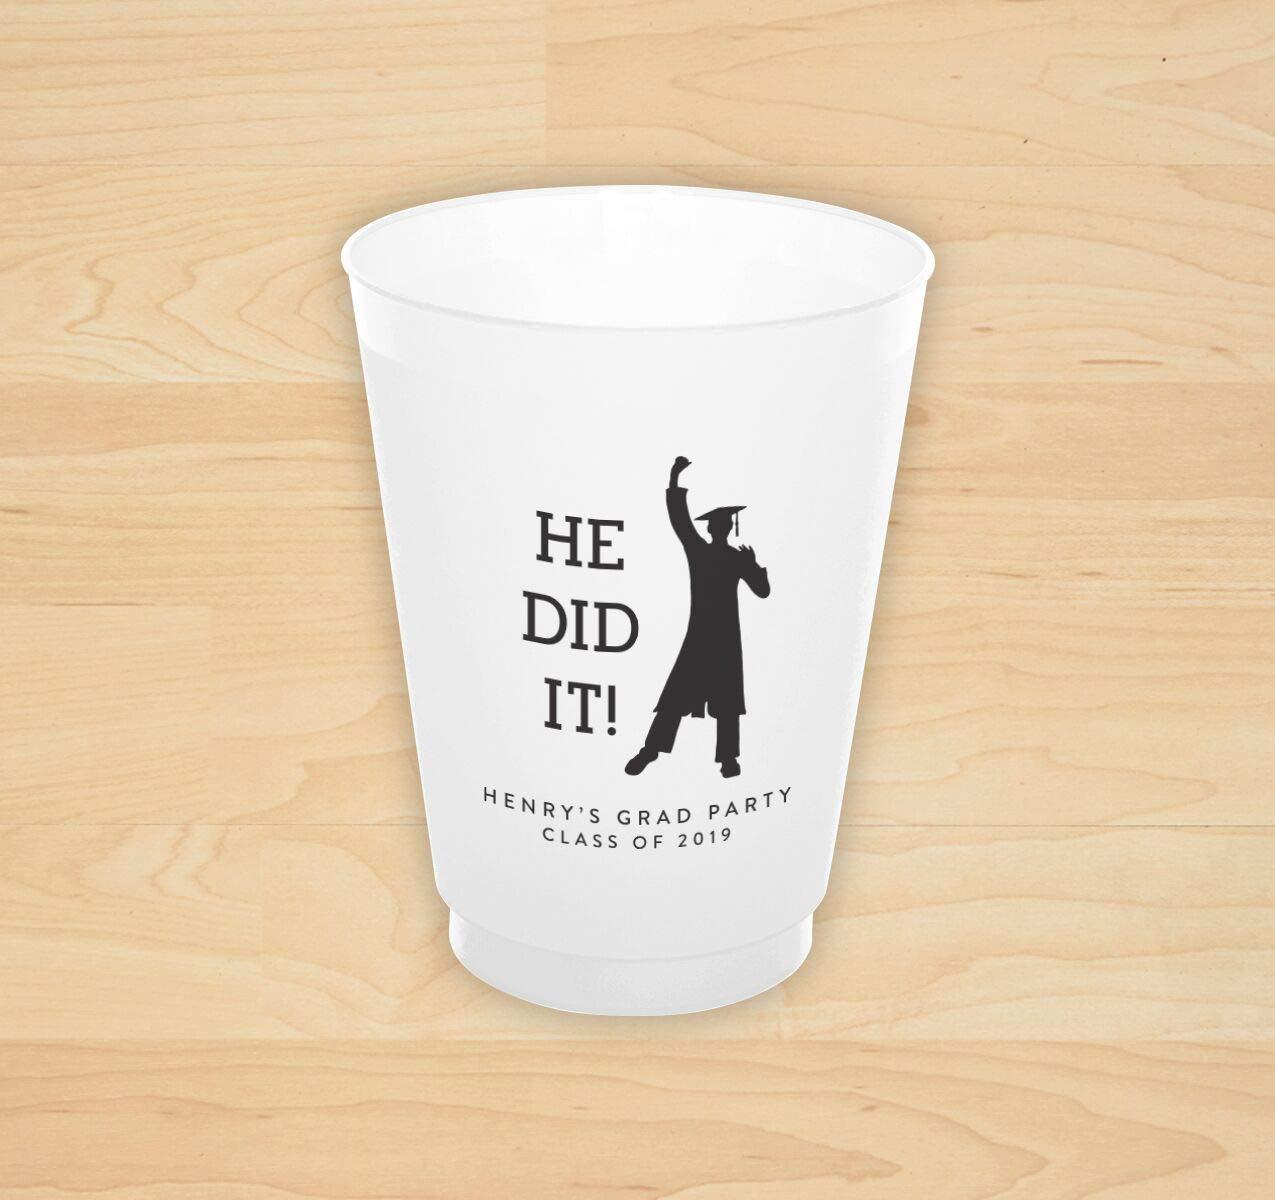 He Did It! Grad Cup - Set of 50-4172